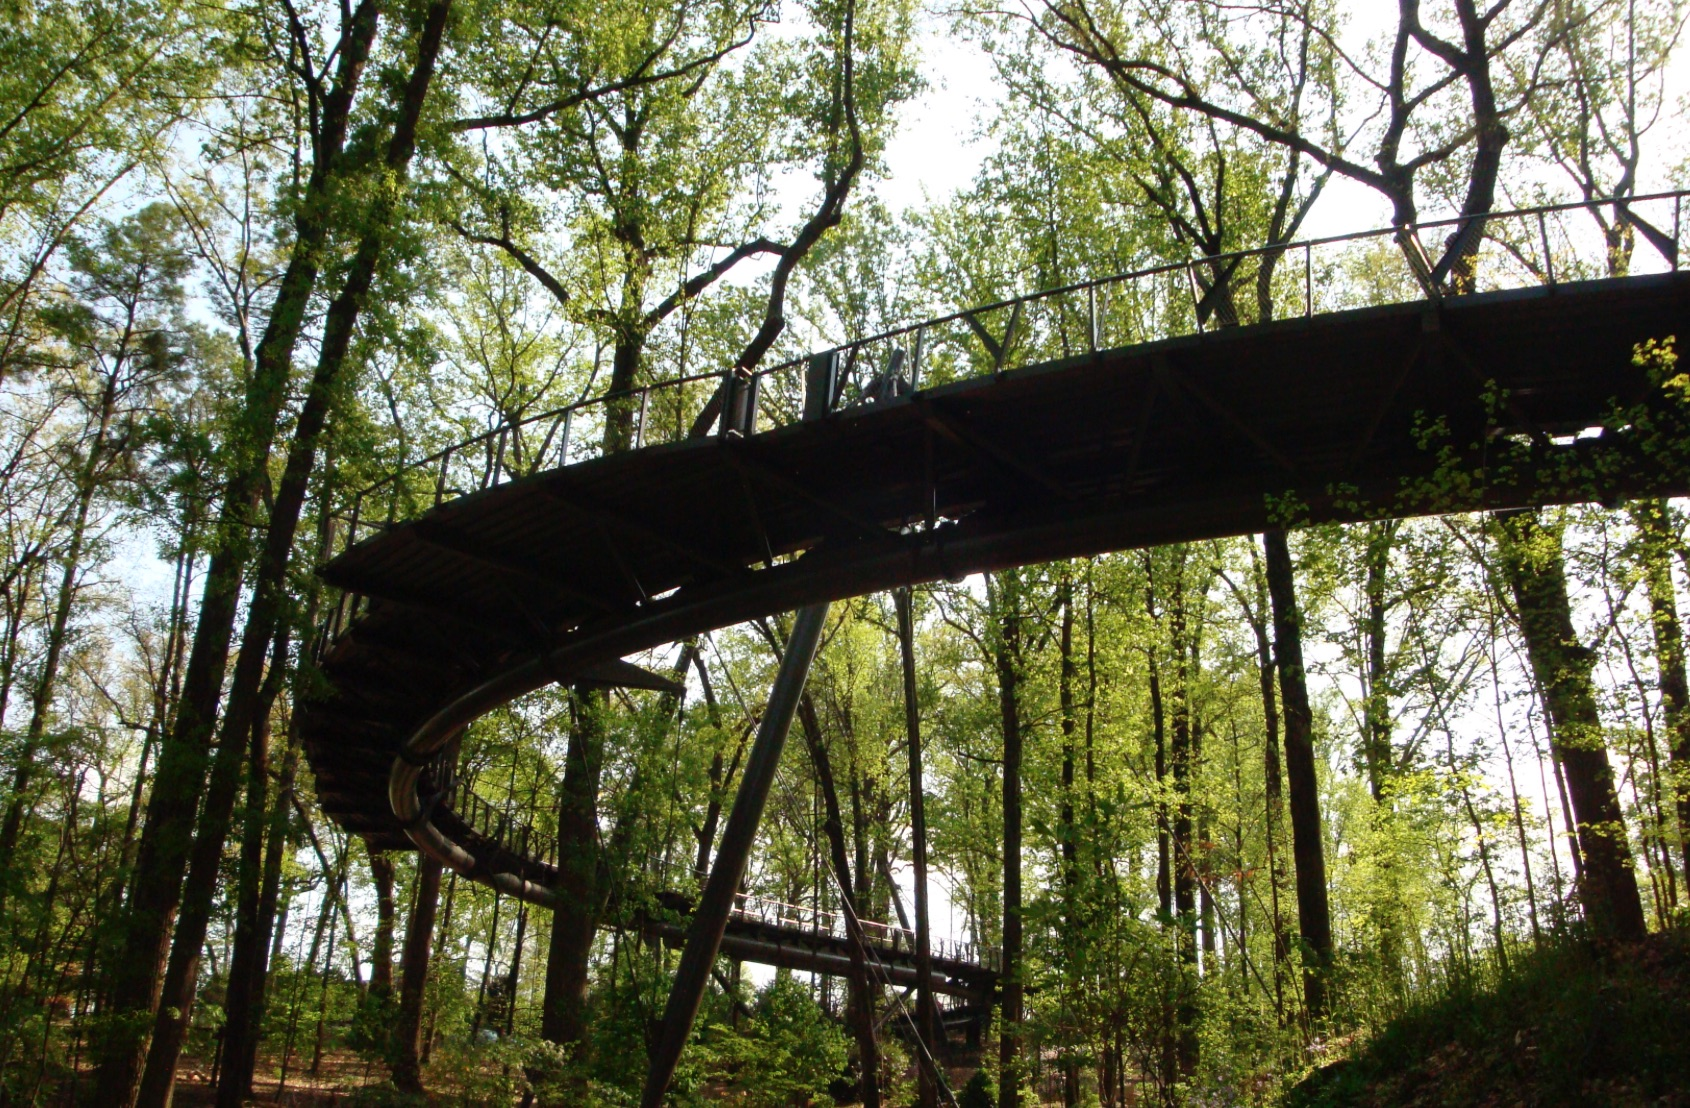 Tree canopy, Atlanta Botanical Garden